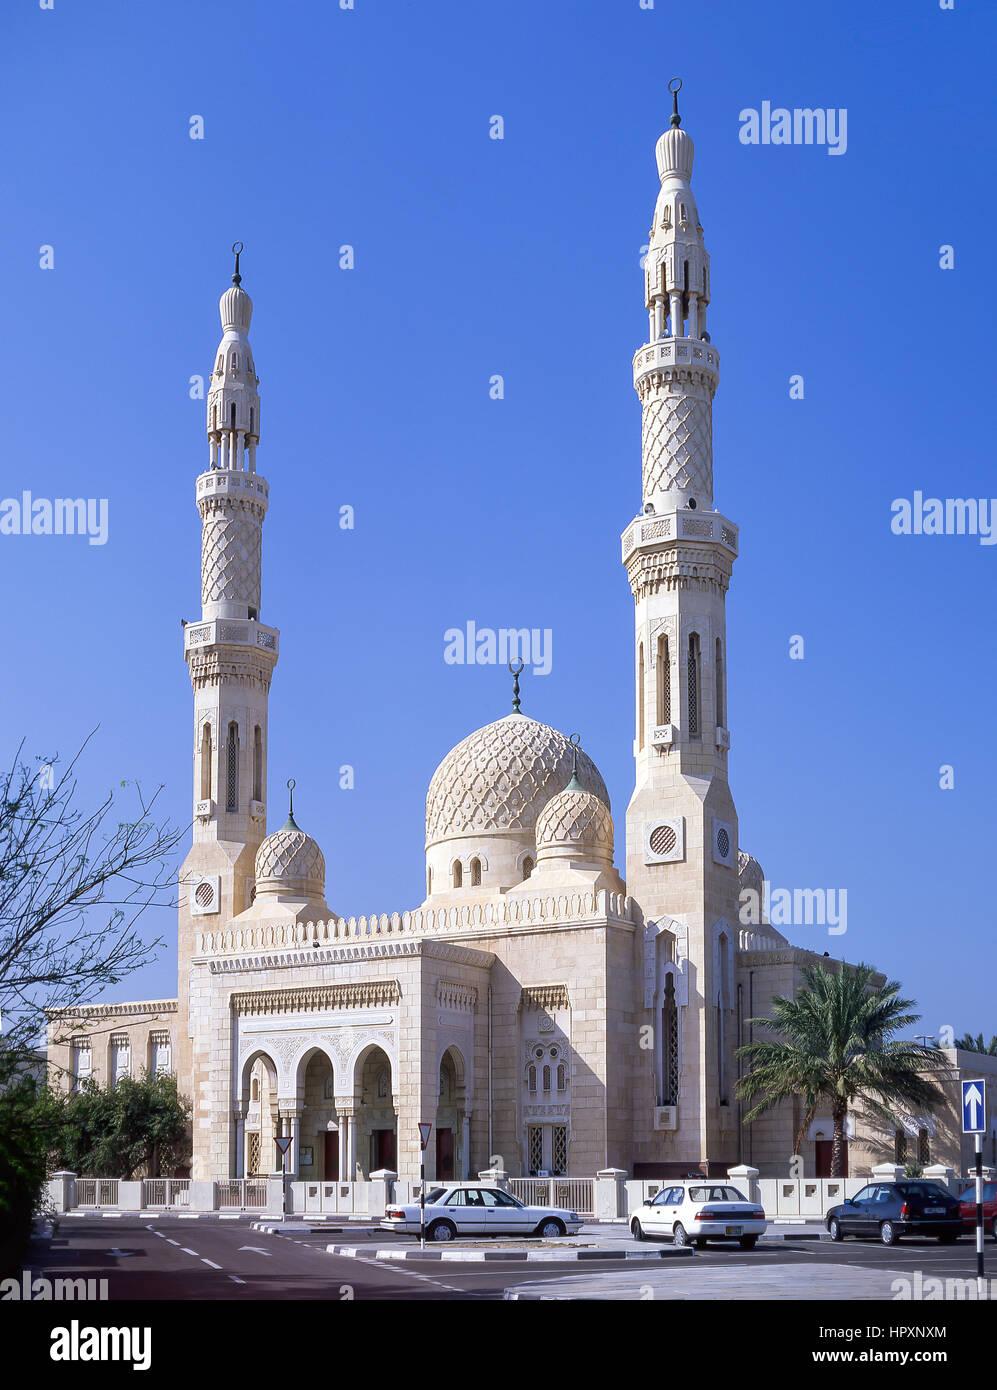 Mezquita Jumeirah, Al Jumeira Road, Jumeirah, Dubai, Emiratos Árabes Unidos. Imagen De Stock